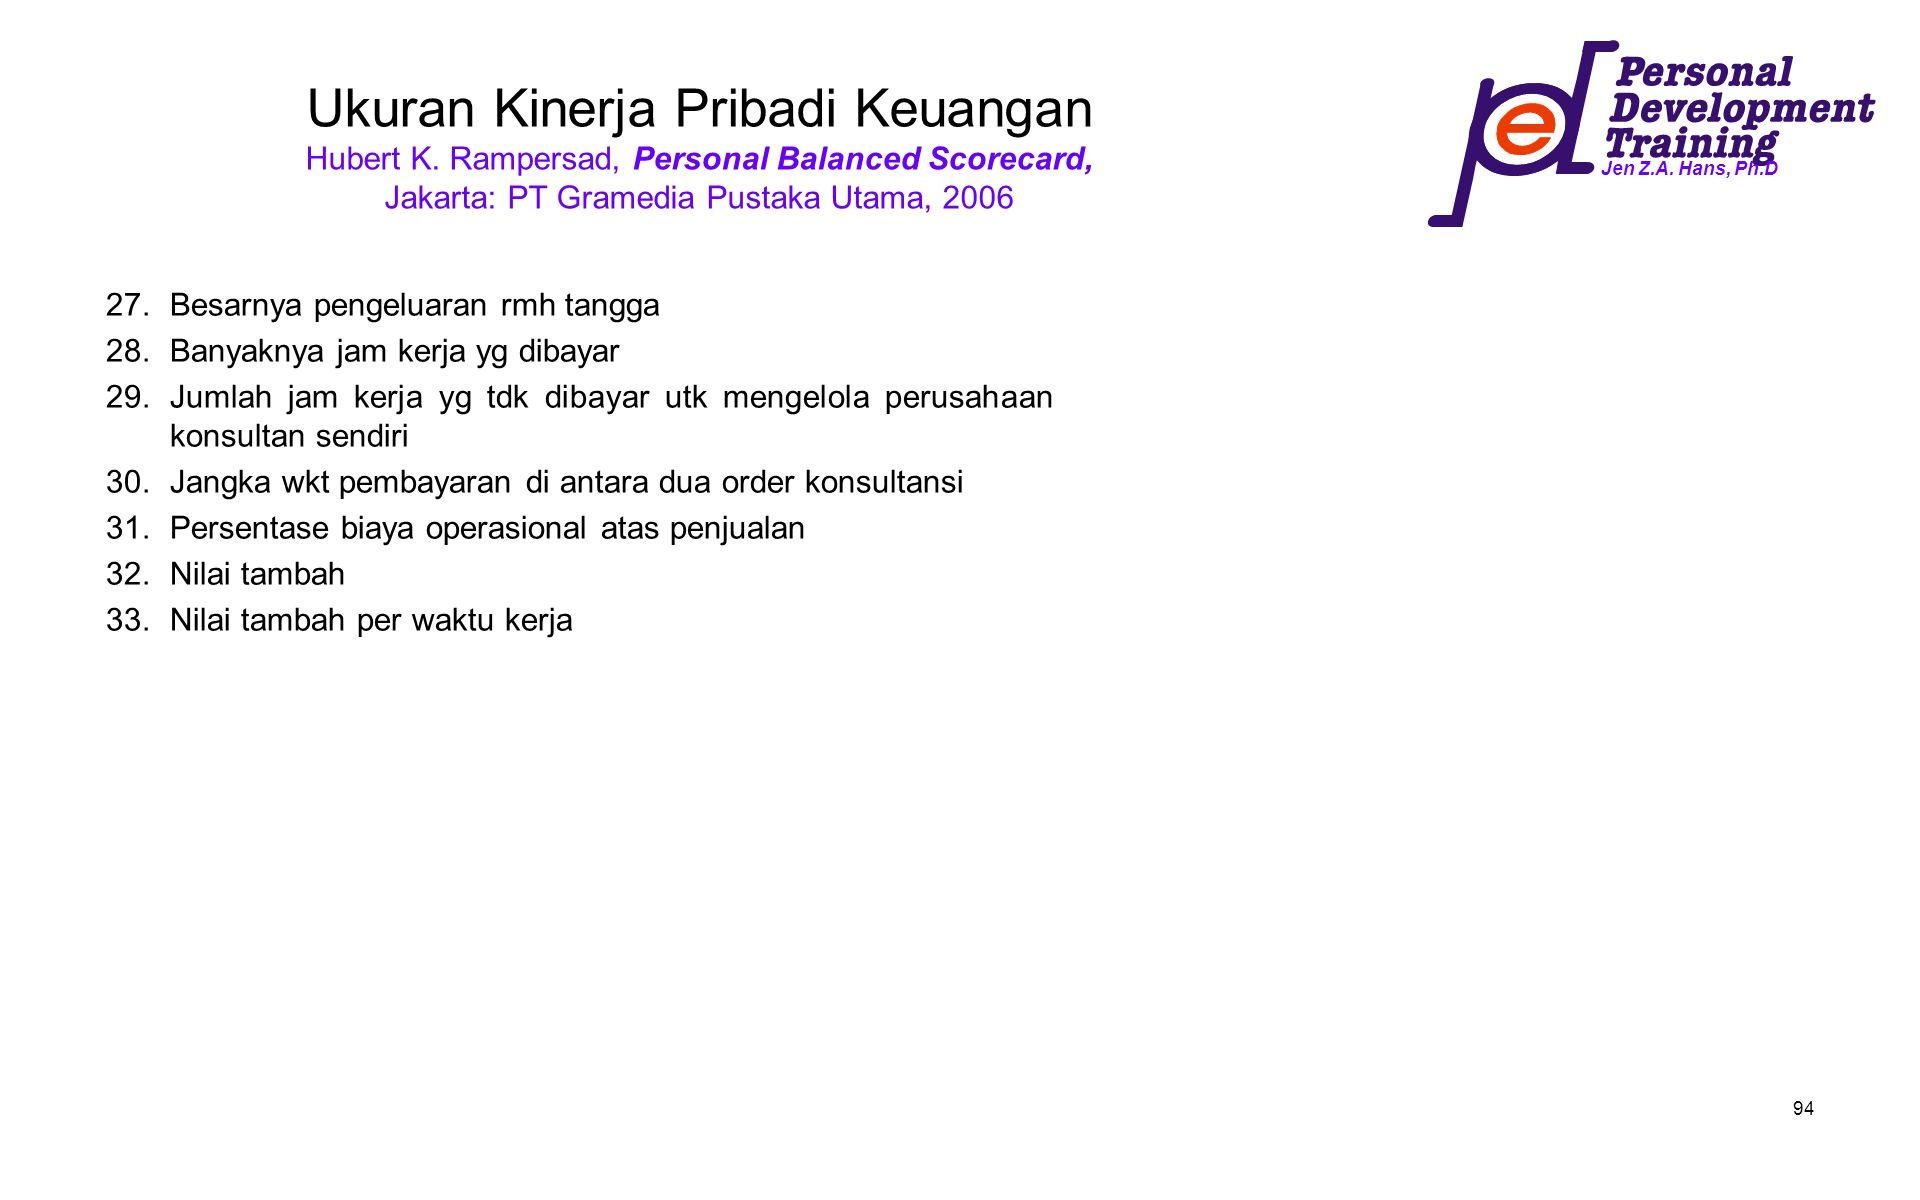 Jen Z.A. Hans, Ph.D 94 Ukuran Kinerja Pribadi Keuangan Hubert K. Rampersad, Personal Balanced Scorecard, Jakarta: PT Gramedia Pustaka Utama, 2006 27.B